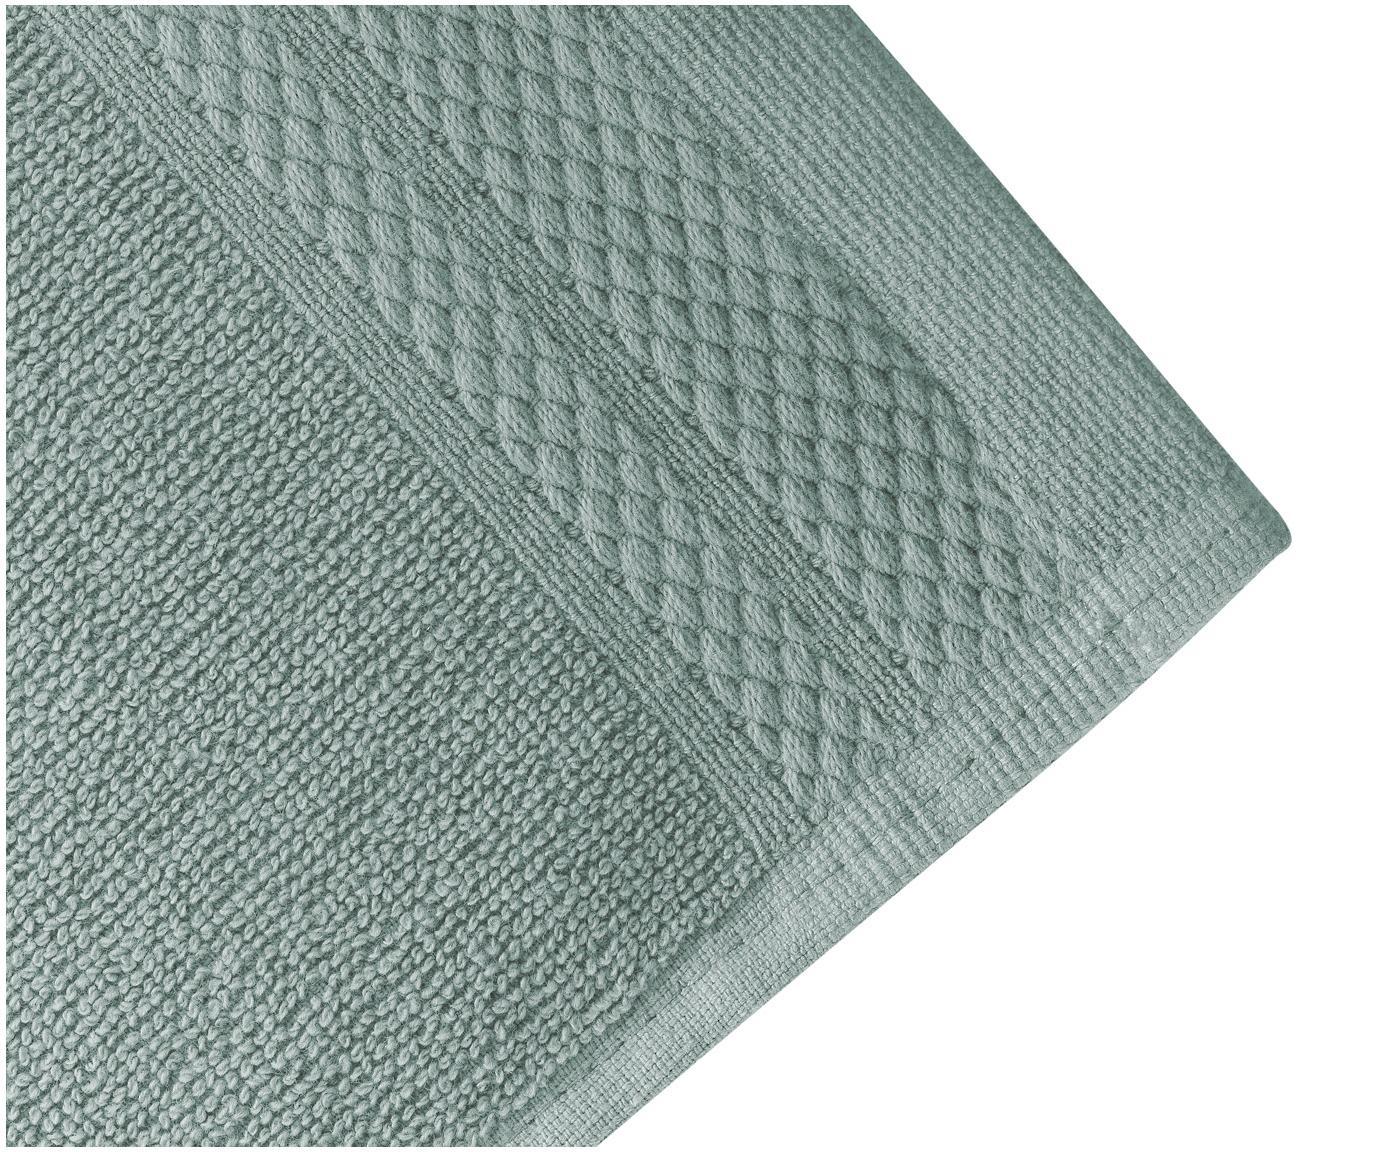 Set asciugamani Premium 3 pz, Verde, Diverse dimensioni